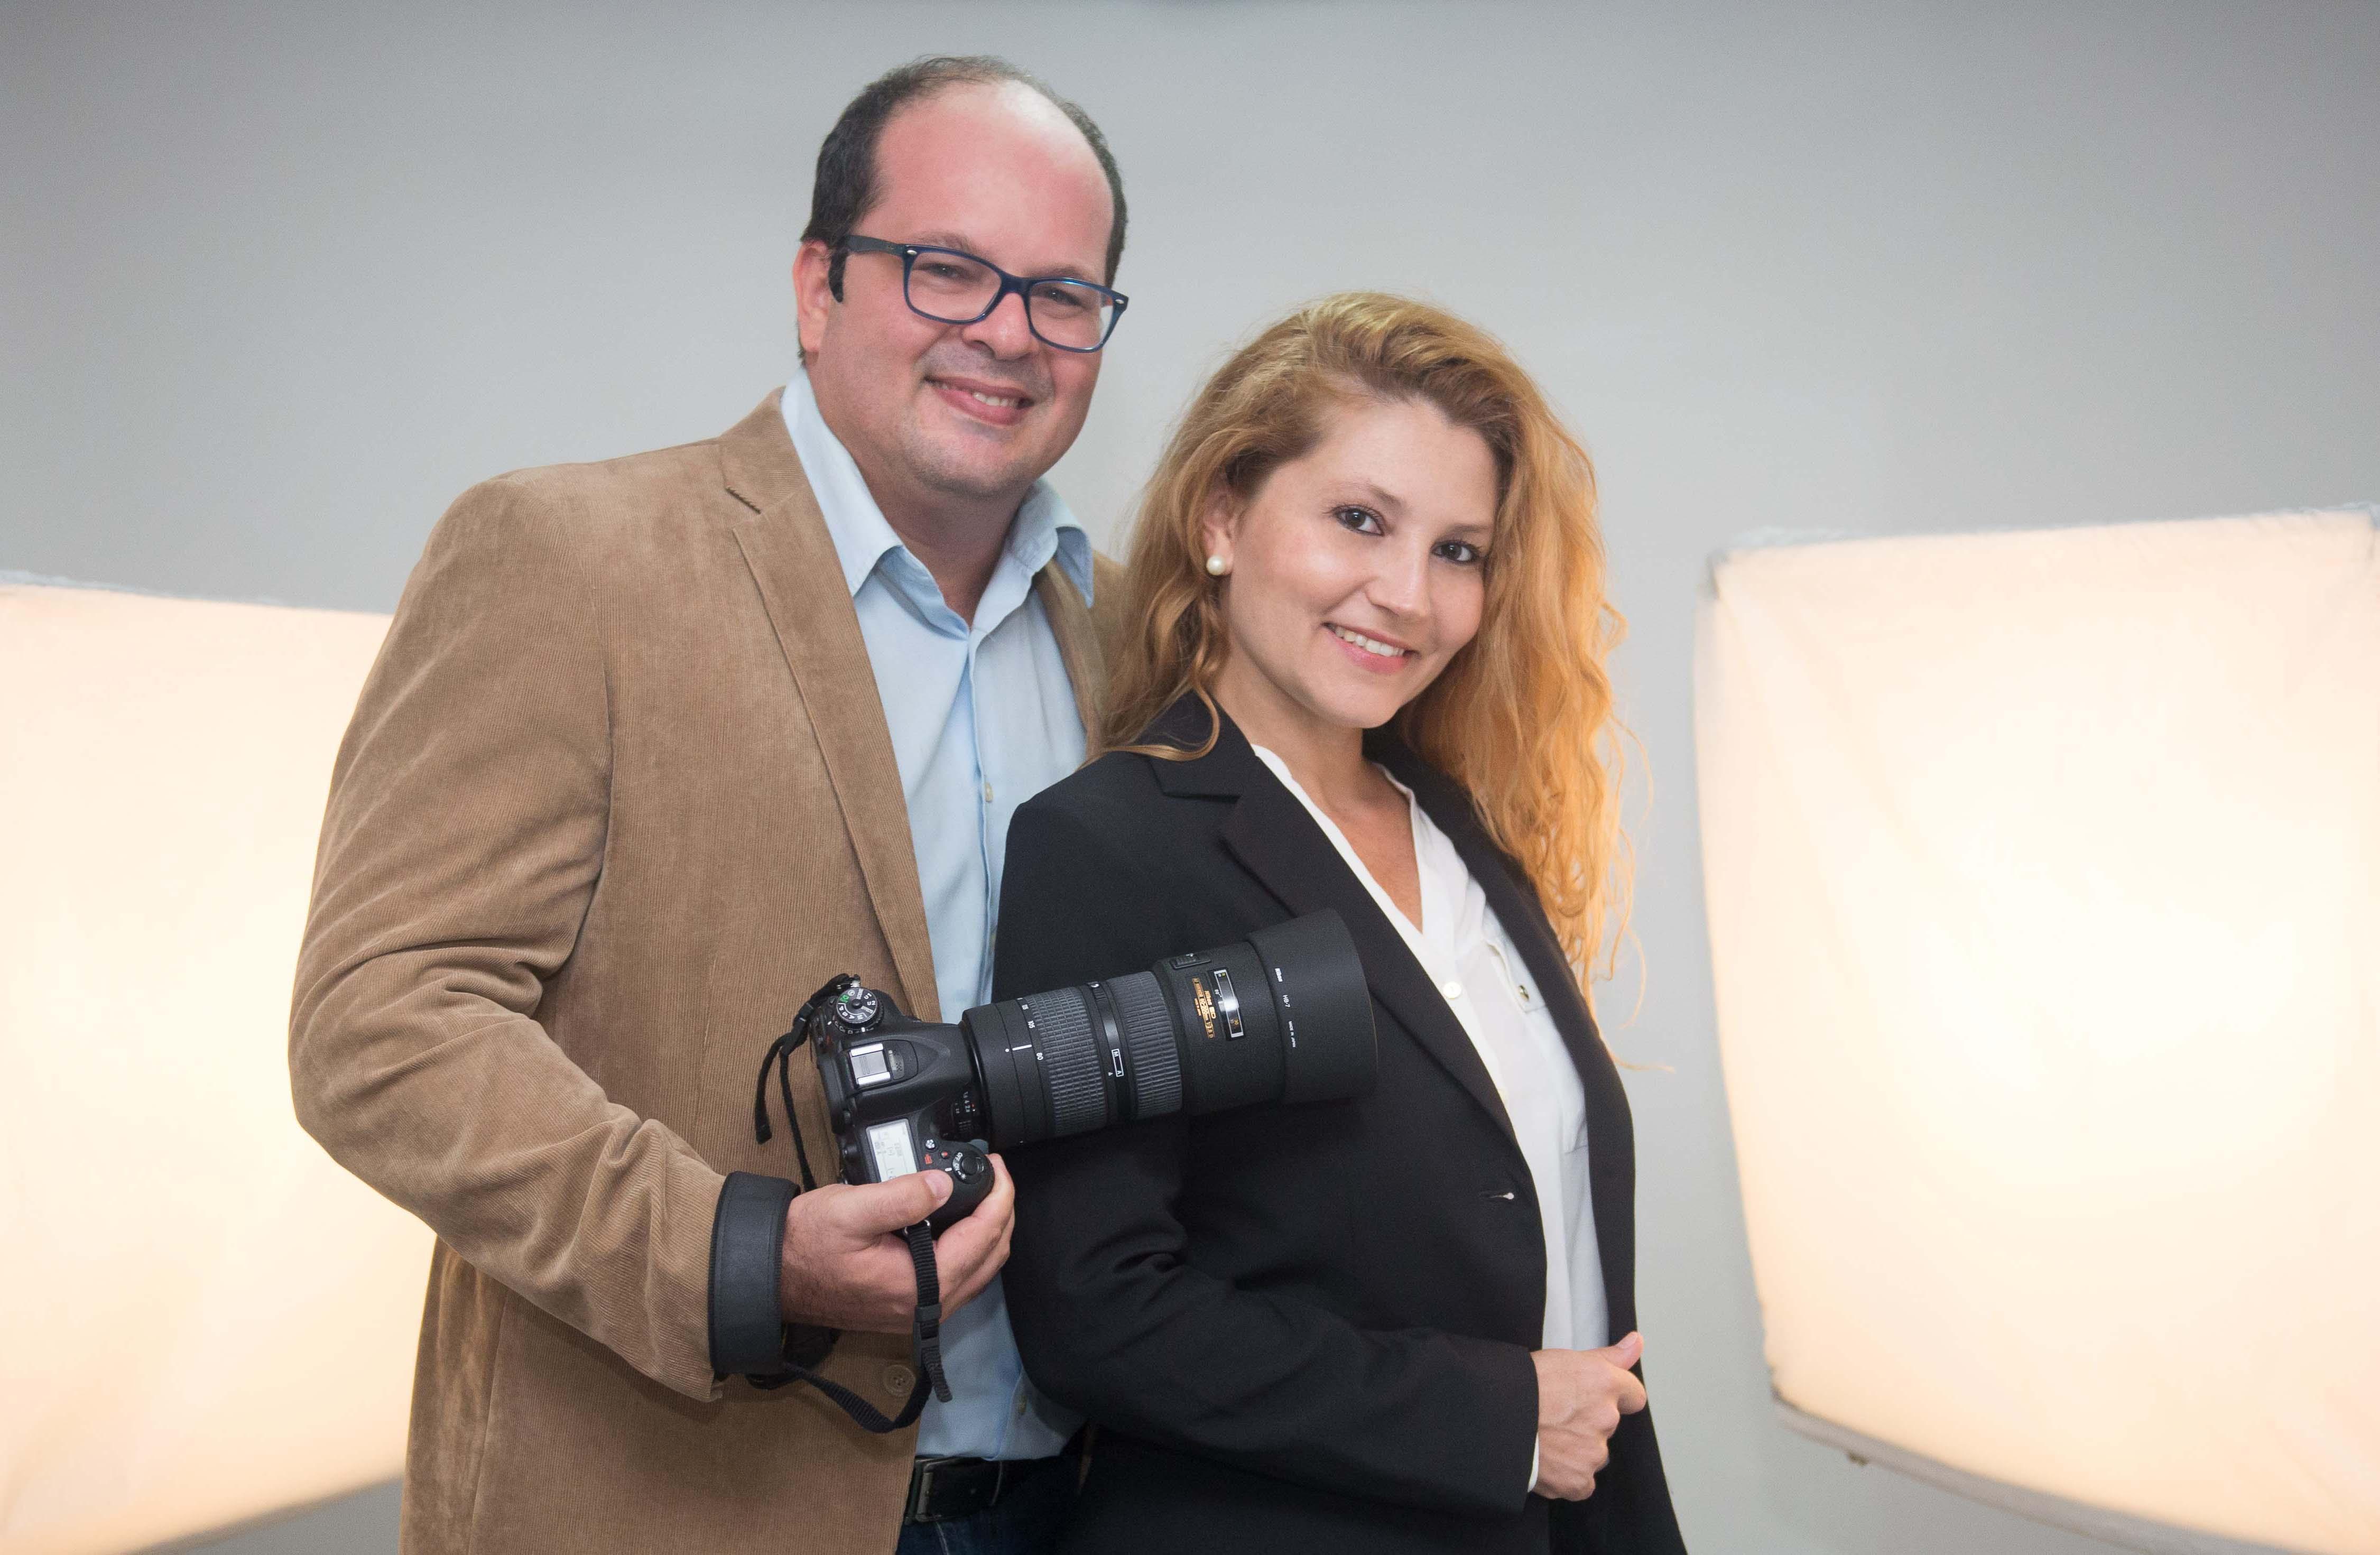 Sobre Classe A Estudio - Fotografo de Casamentos, Ensaios Fotograficos, Estudio Fotografico, Recife - PE